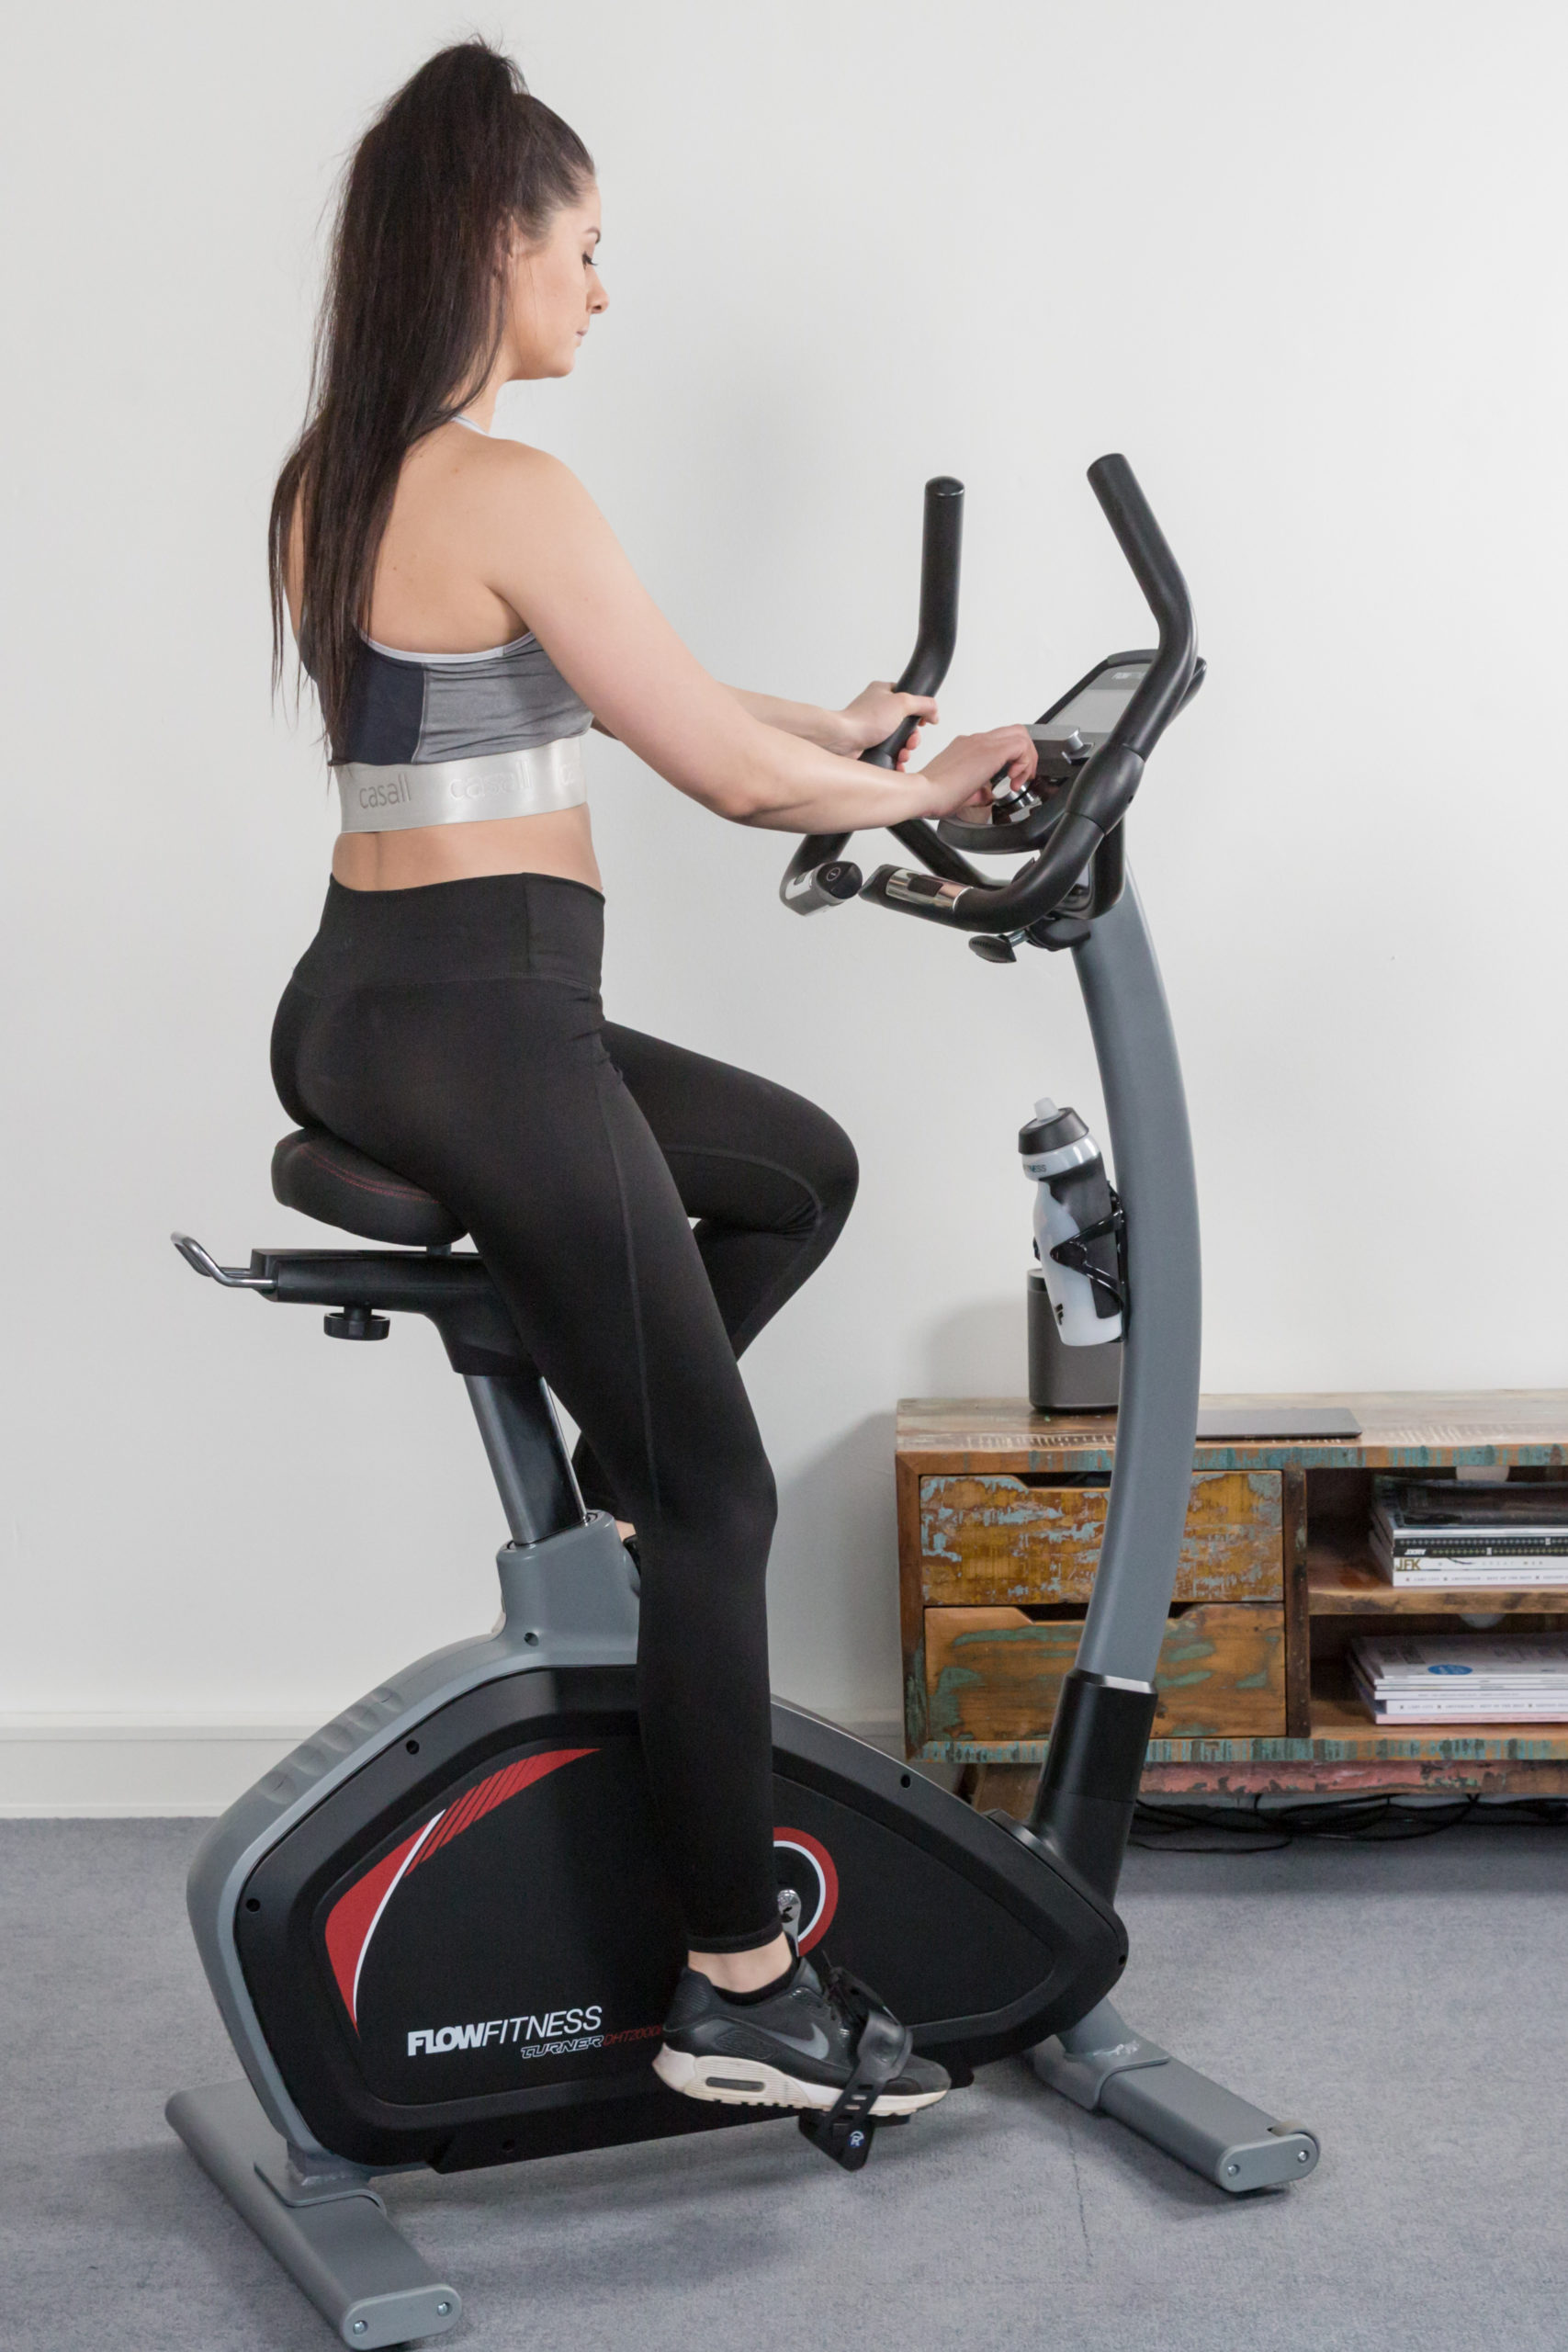 Flow Fitness Tabel Turner DHT2000i Hometrainer 3